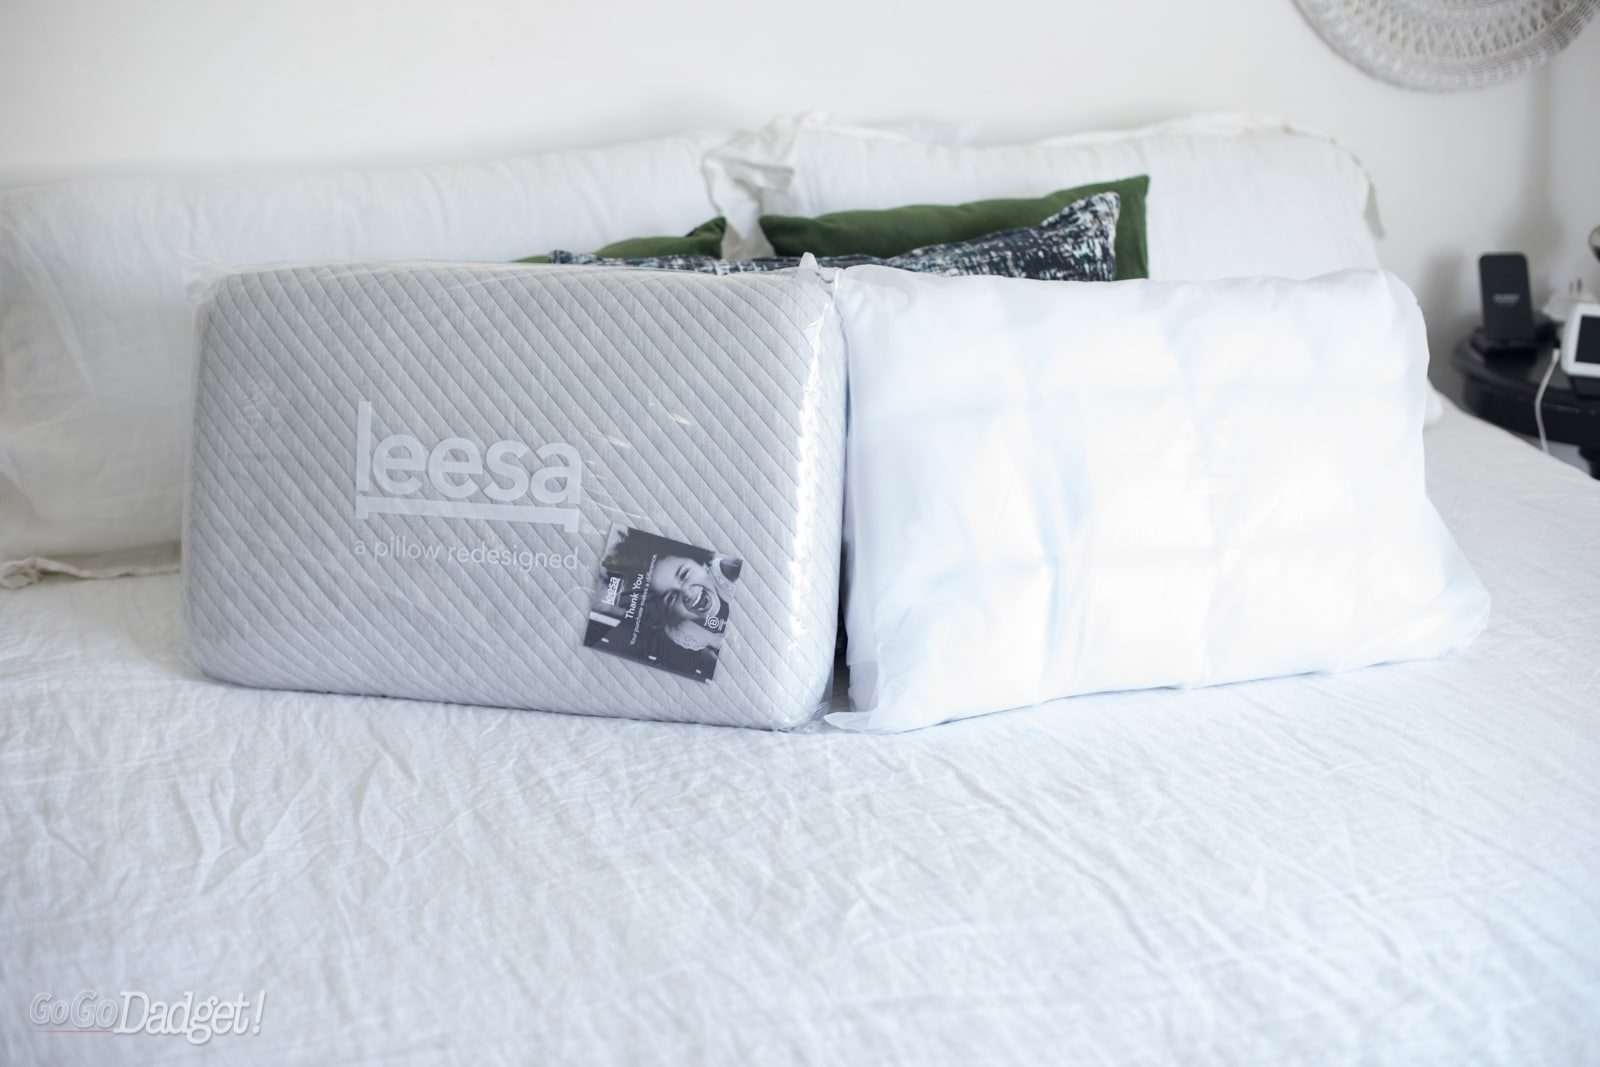 the new leesa hybrid pillow is a dream